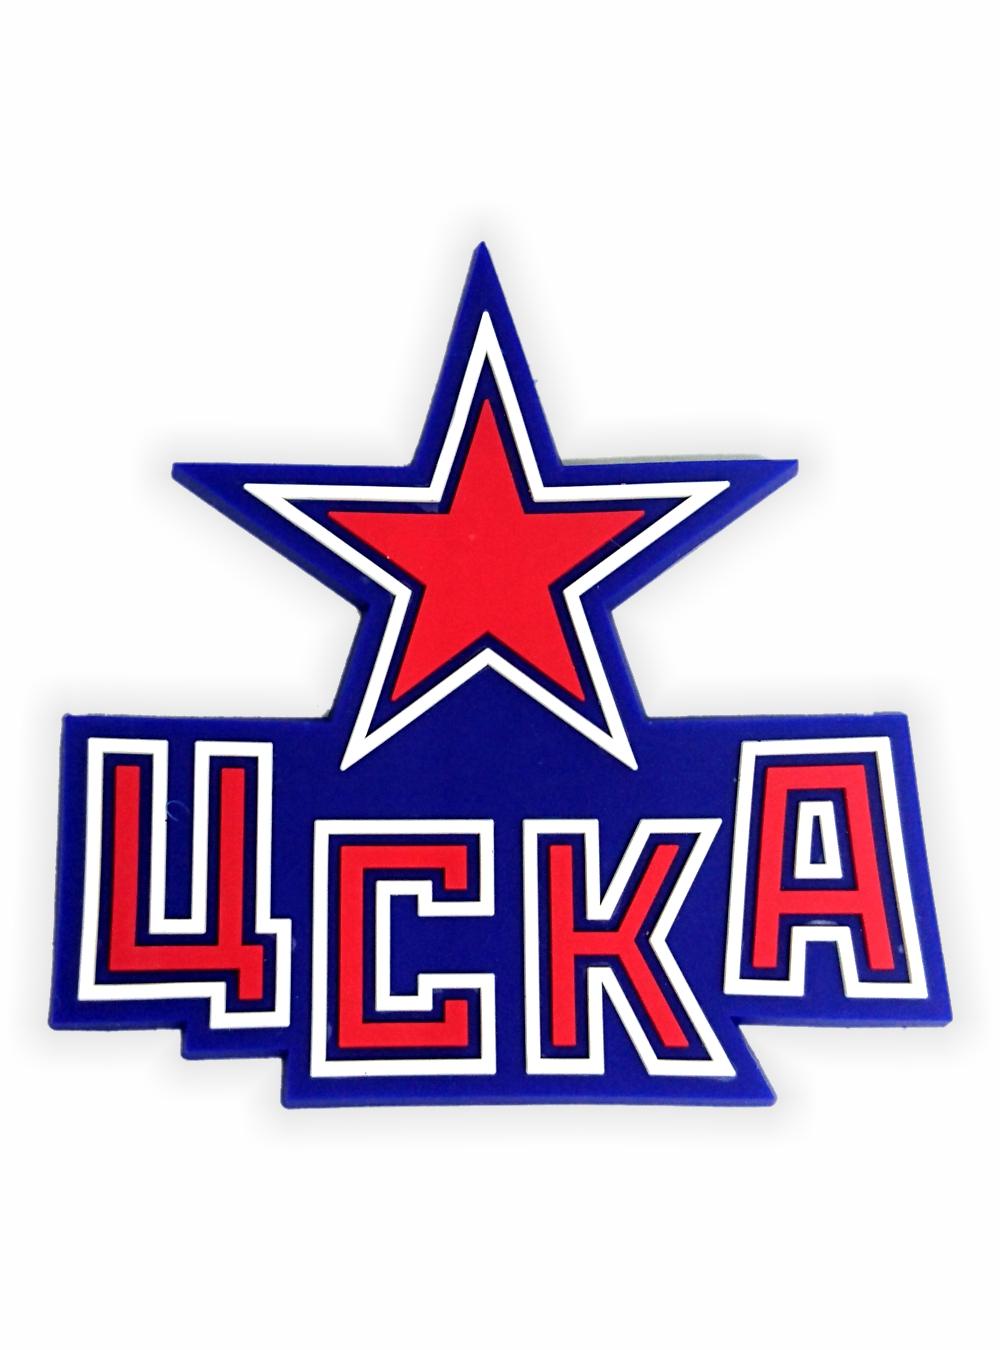 Магнит ХК ЦСКА №2 (звезда)Хоккейная атрибутика <br>Магнит ХК ЦСКА №2 (звезда)<br>